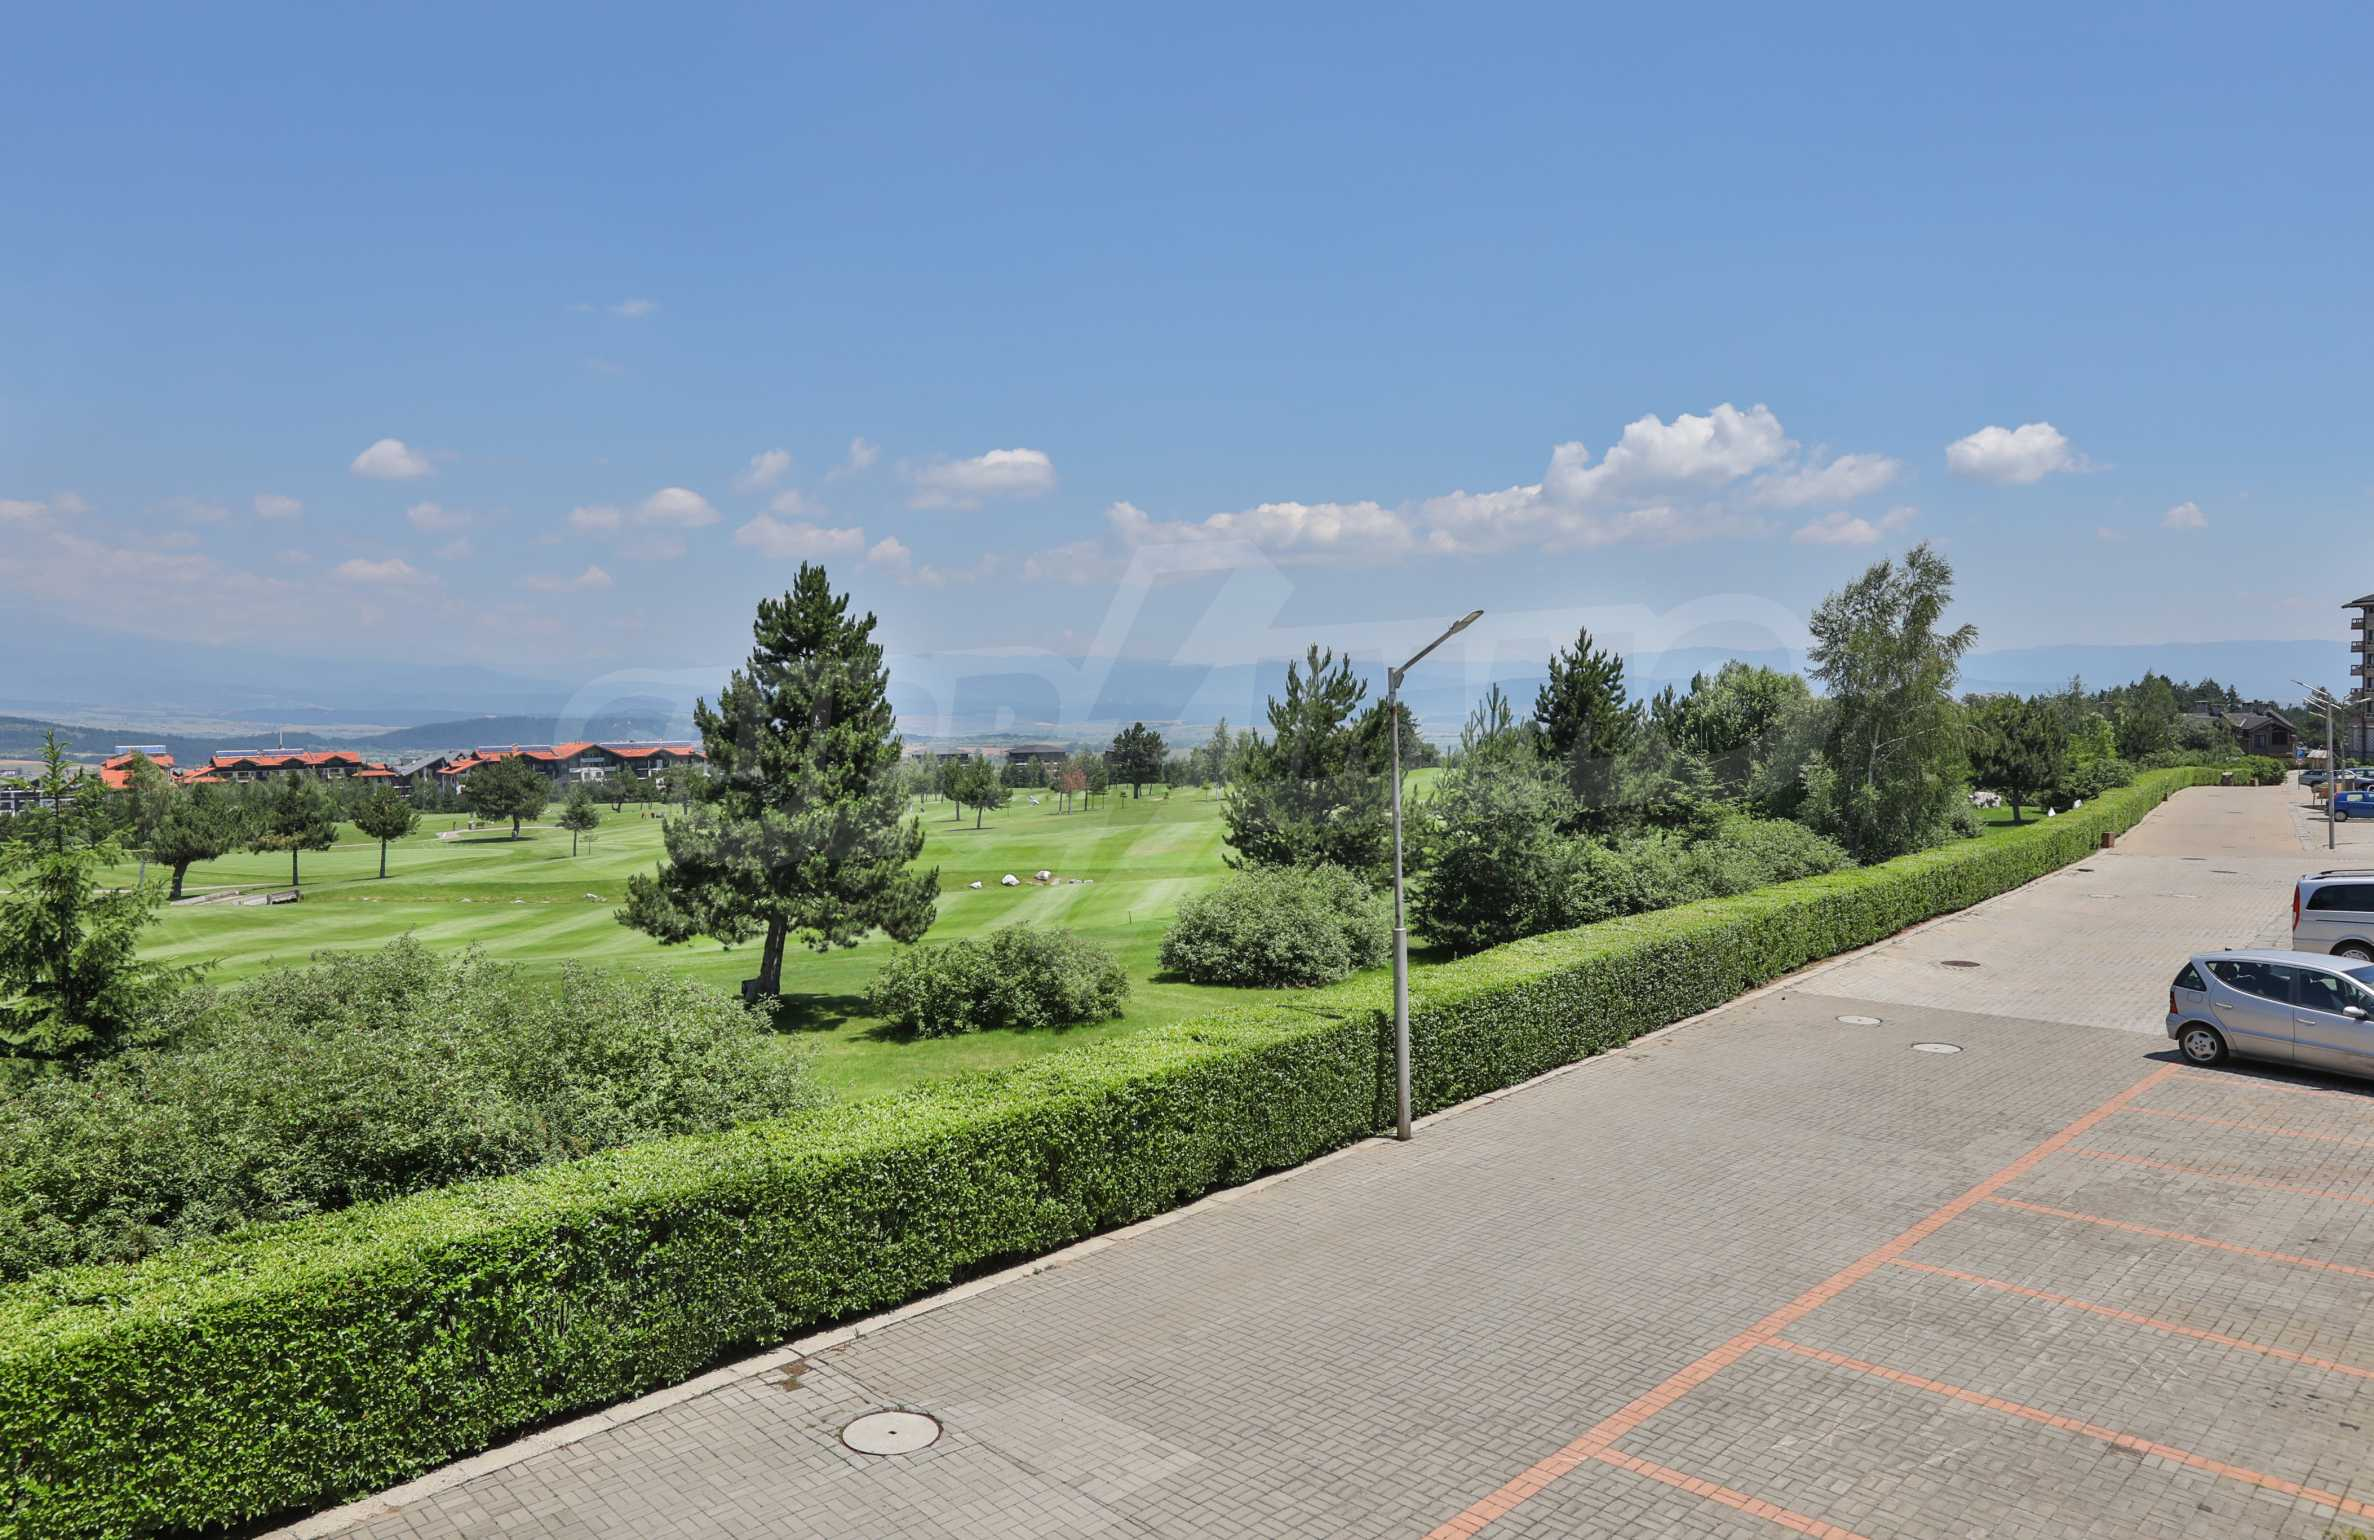 Широк избор от апартаменти в голф комплекс, гр. Разлог 24